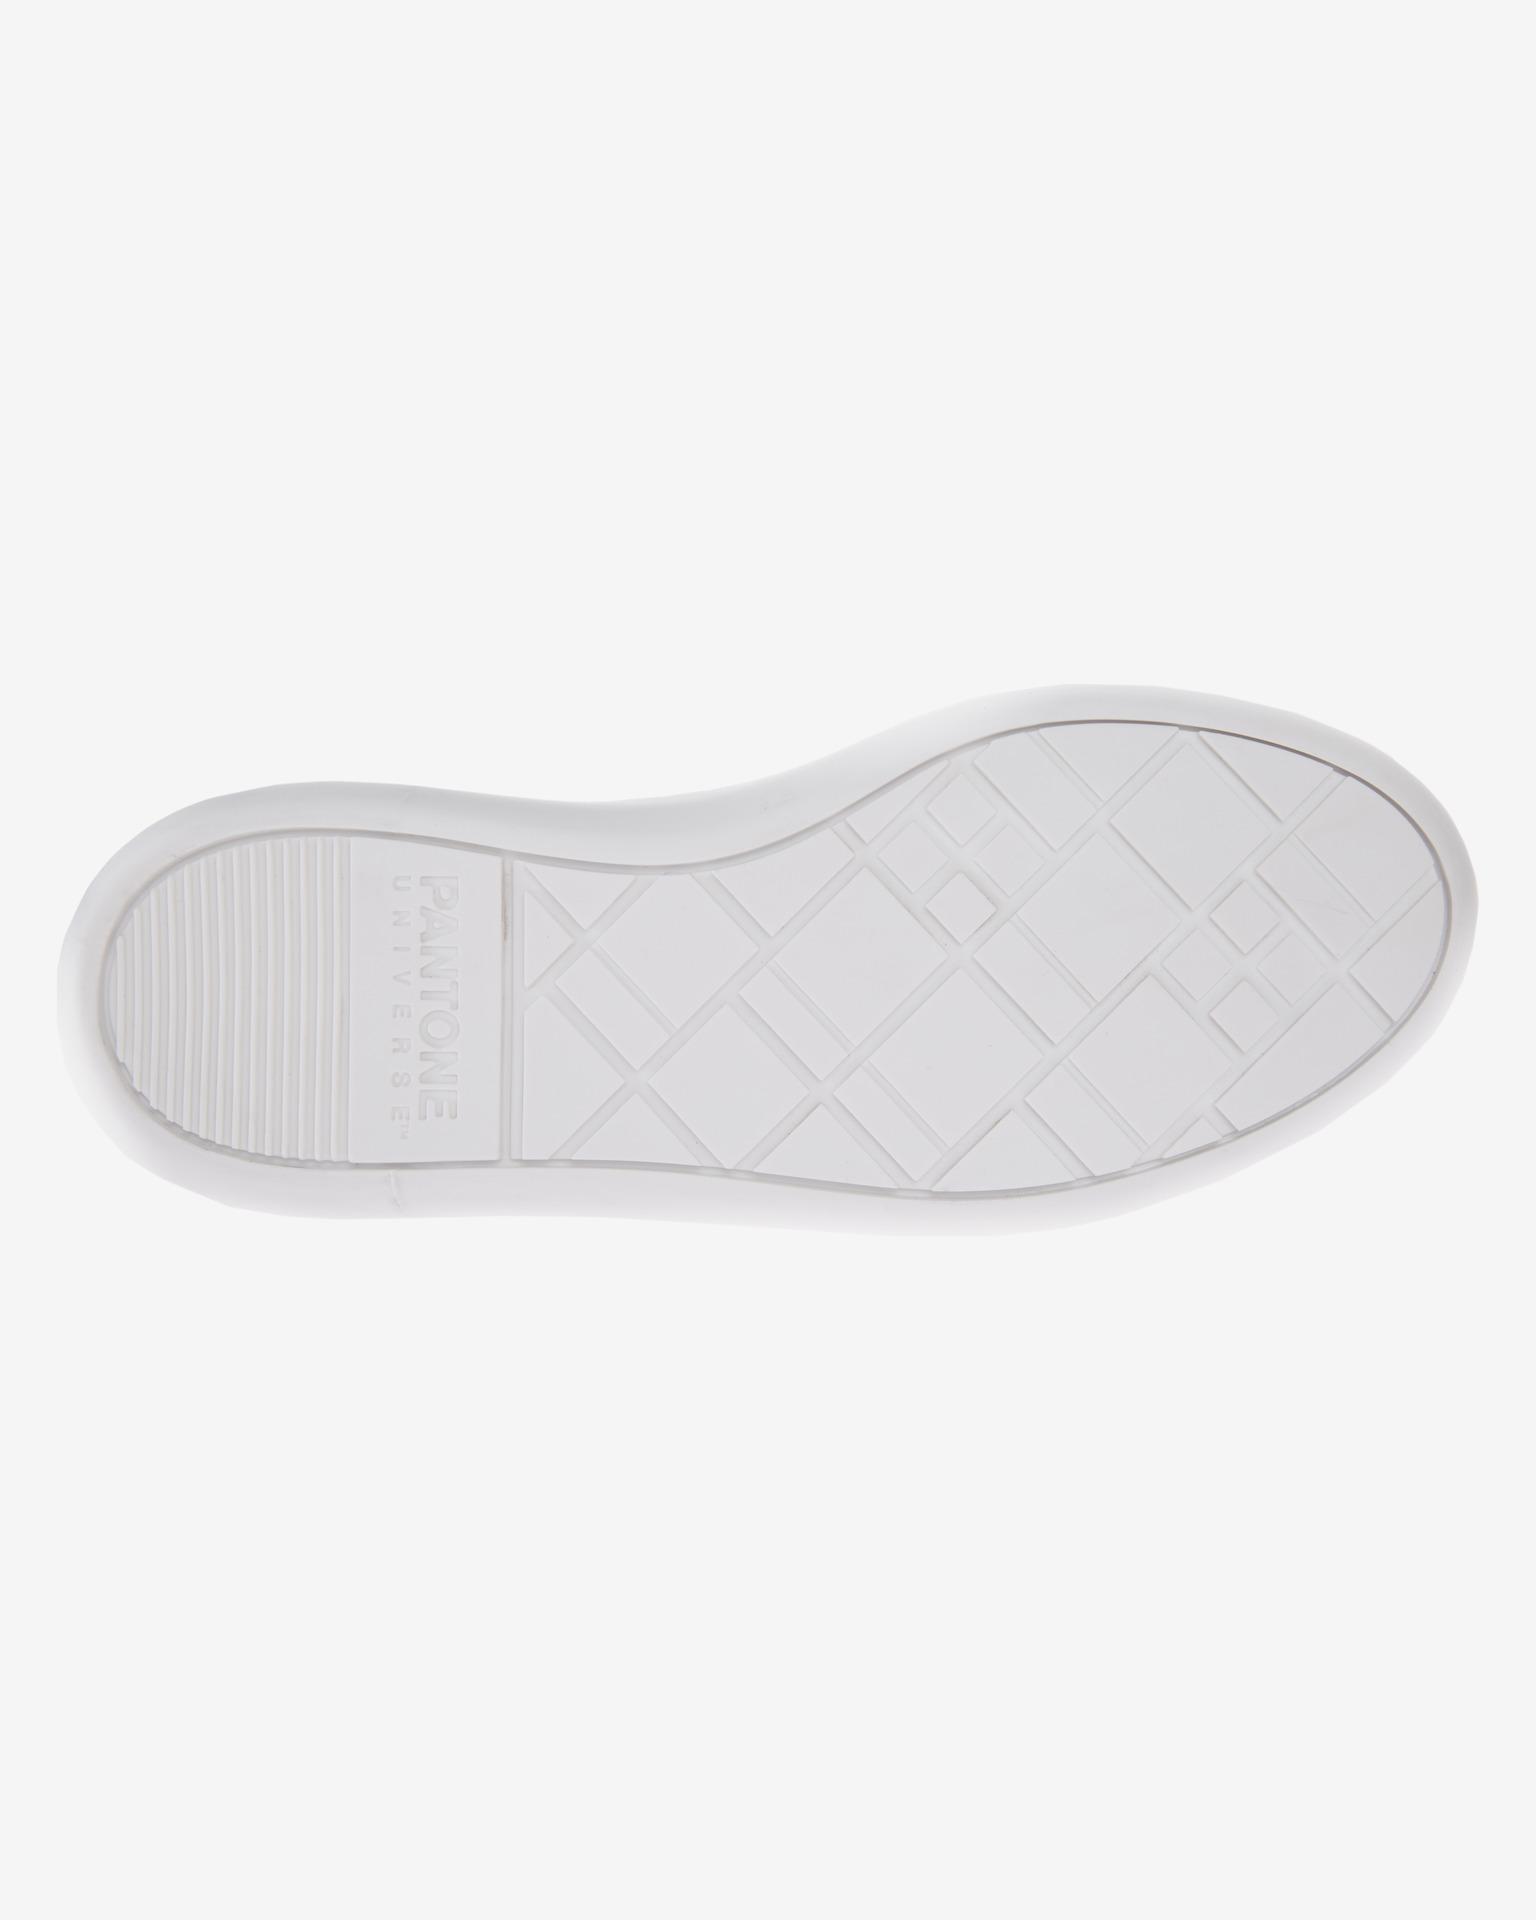 Usa Chaussures De Sport Ouvert Univers Pantone 01iizwB4HE